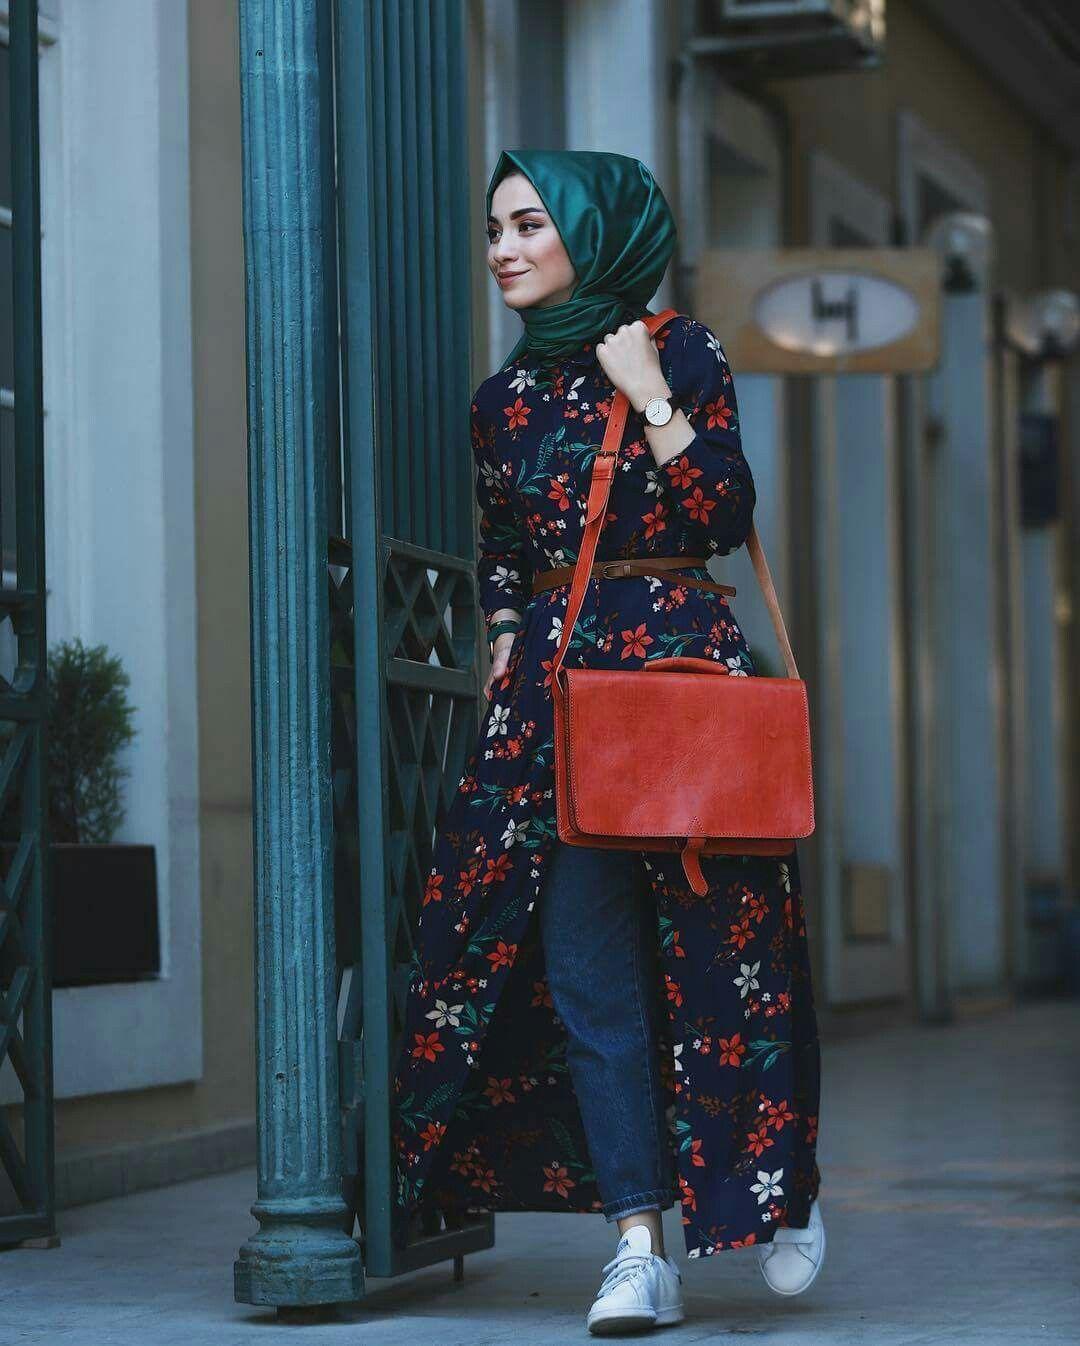 Wedding decorations muslim october 2018 alnaz alnazali on Pinterest